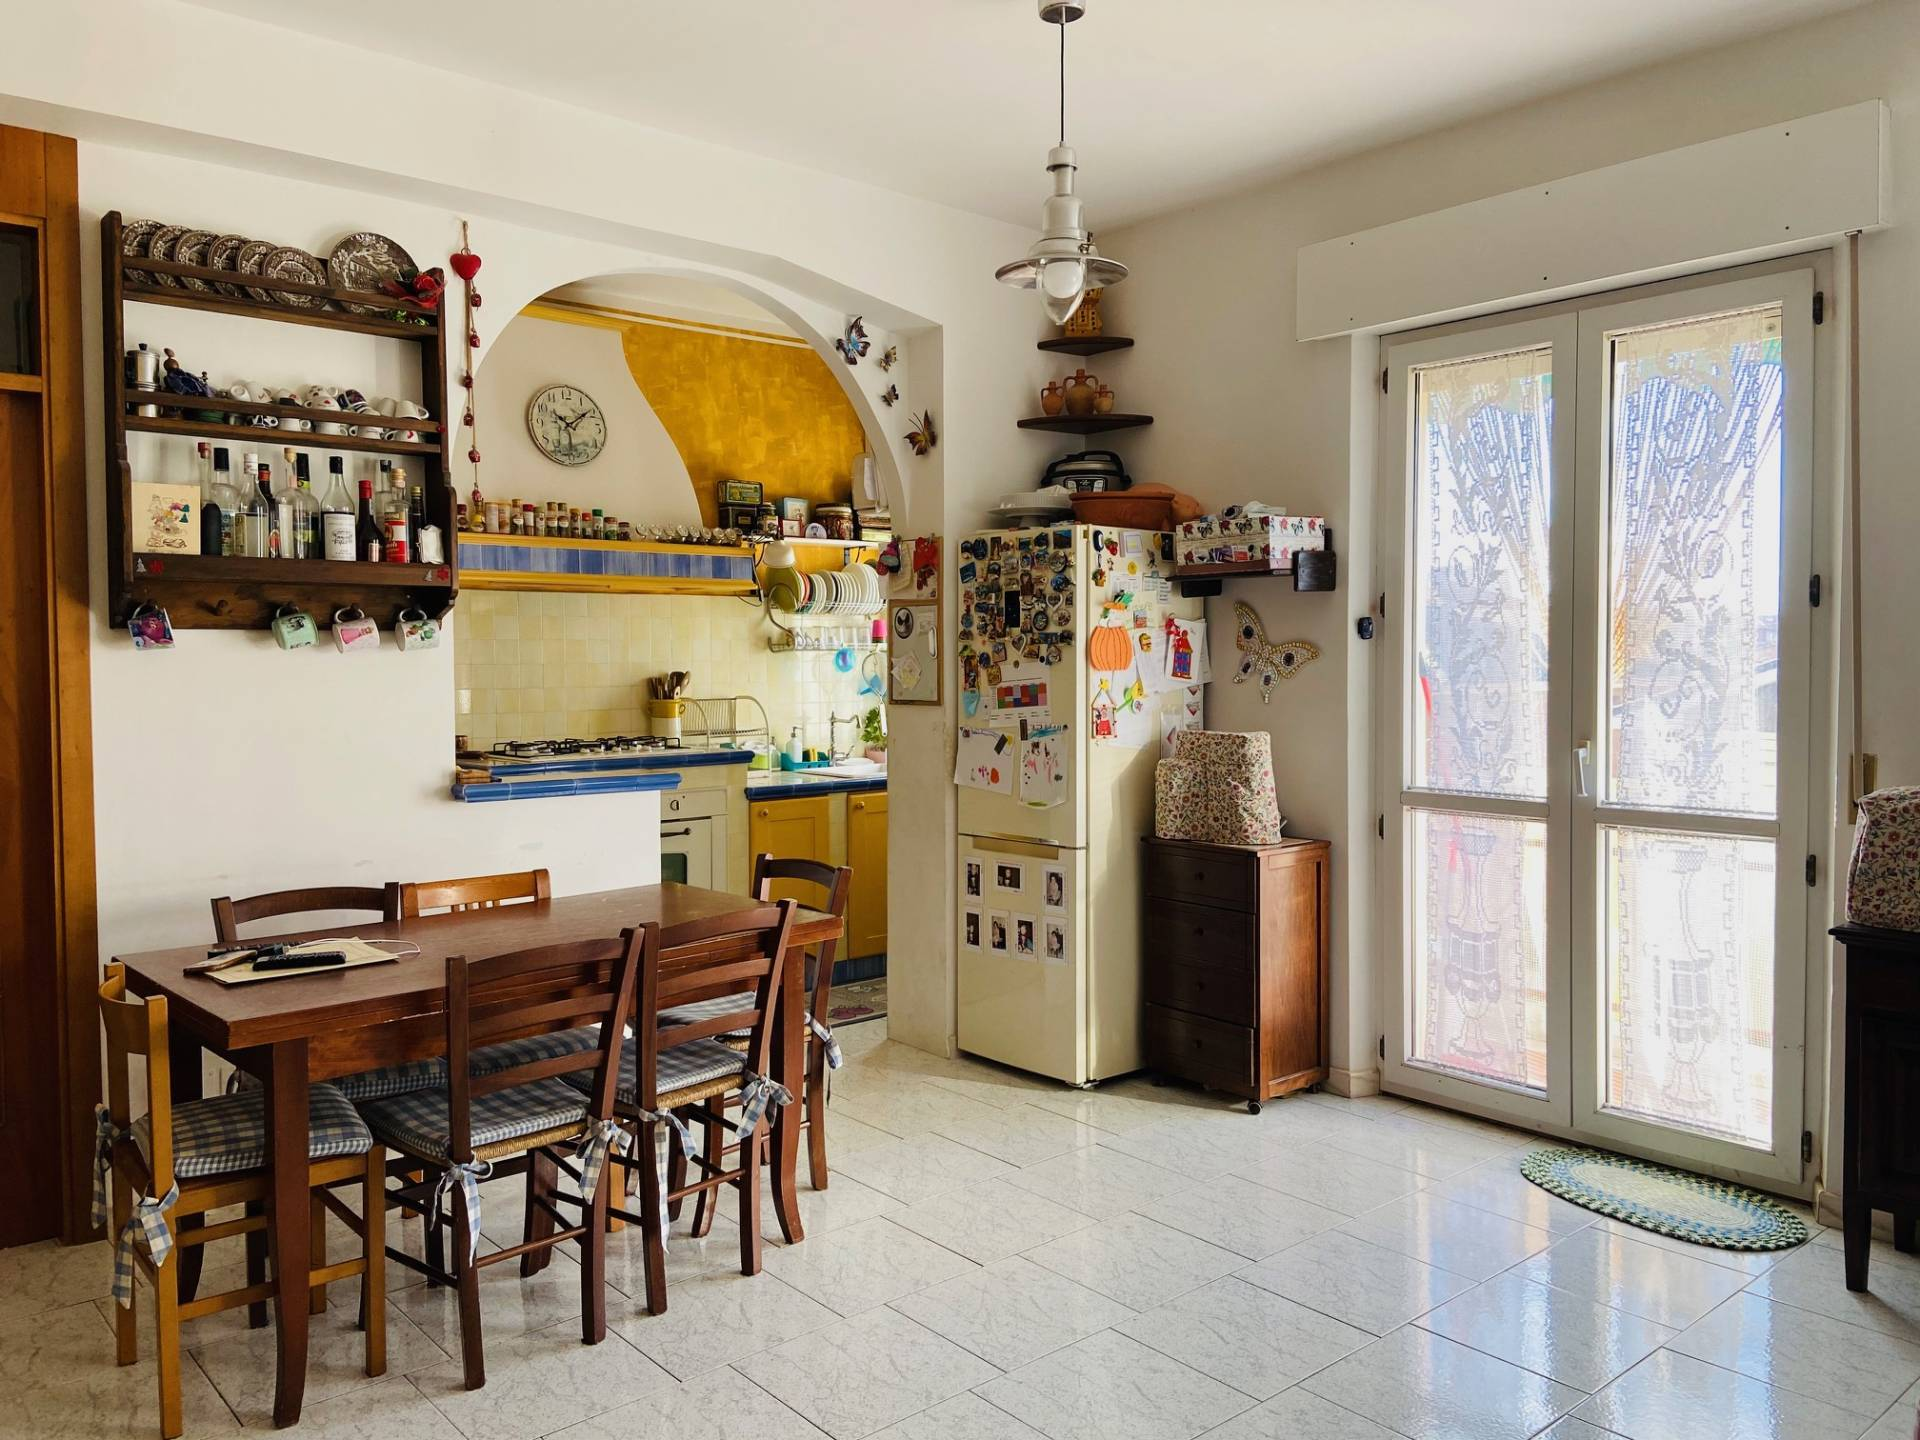 Appartamento in vendita a Marina Di Montemarciano, Montemarciano (AN)